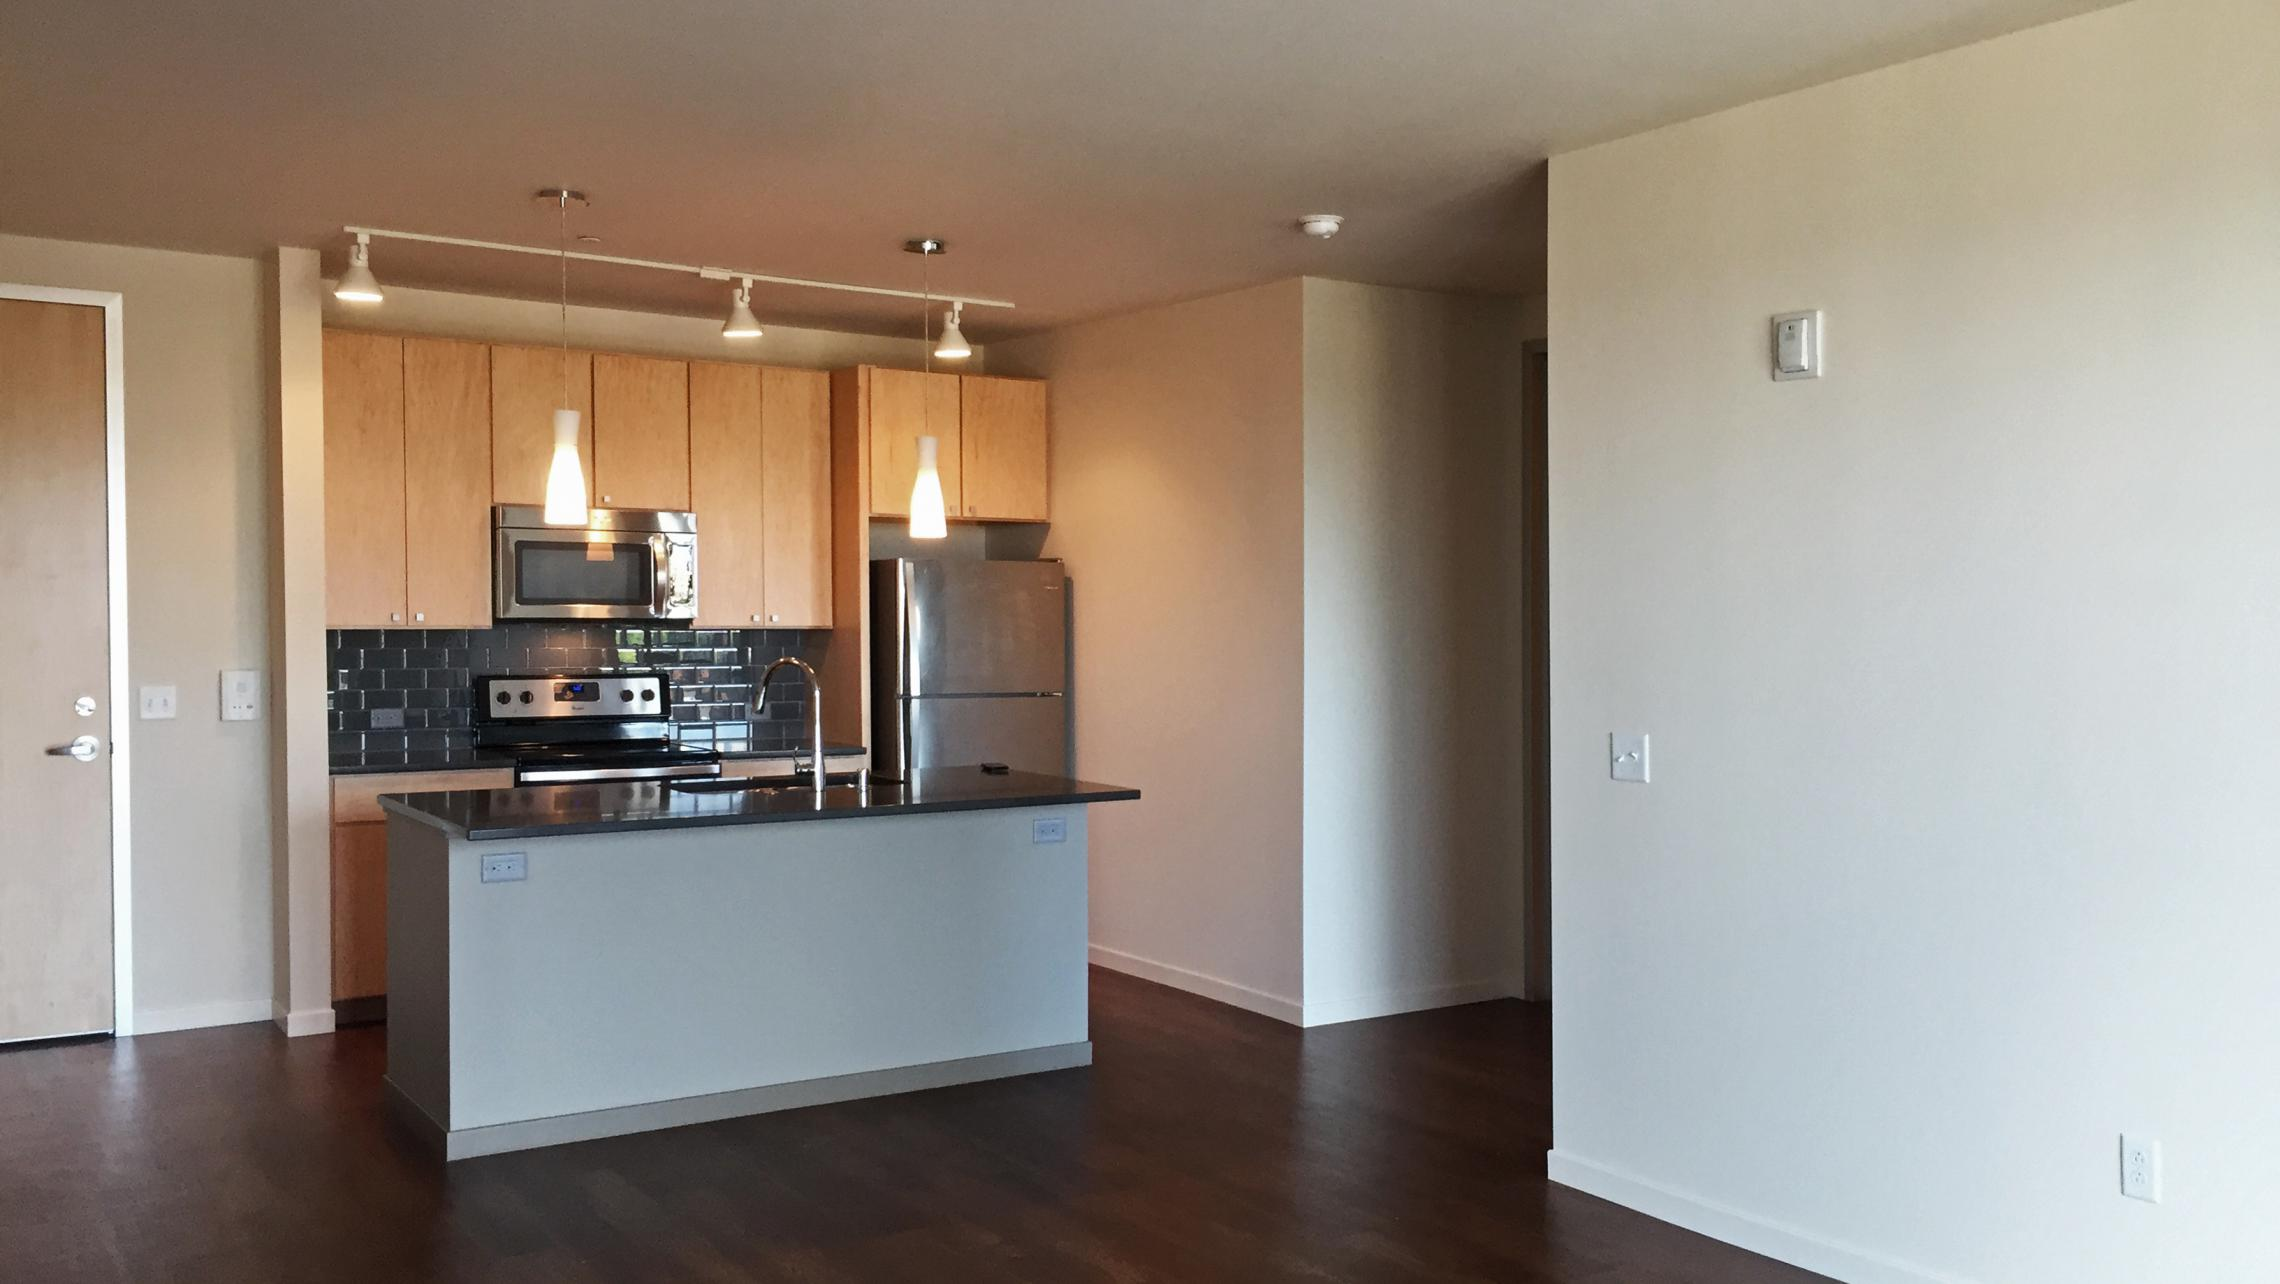 ULI Nine Line Apartment 422 - Kitchen and Living Area